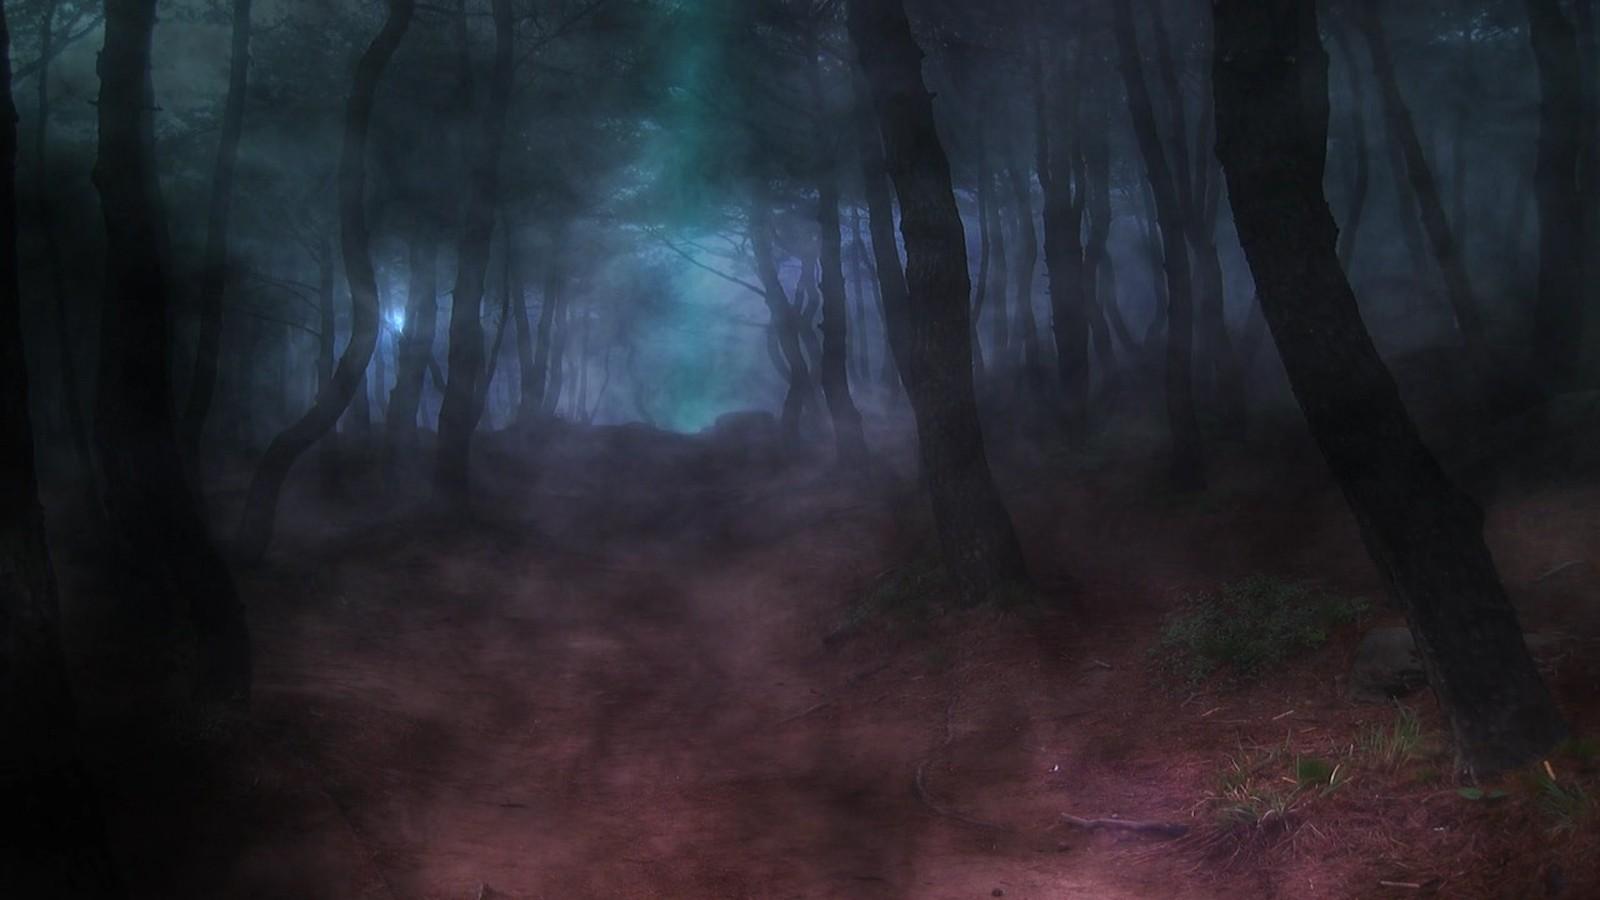 Dark Wood Forests Paths Wallpaper